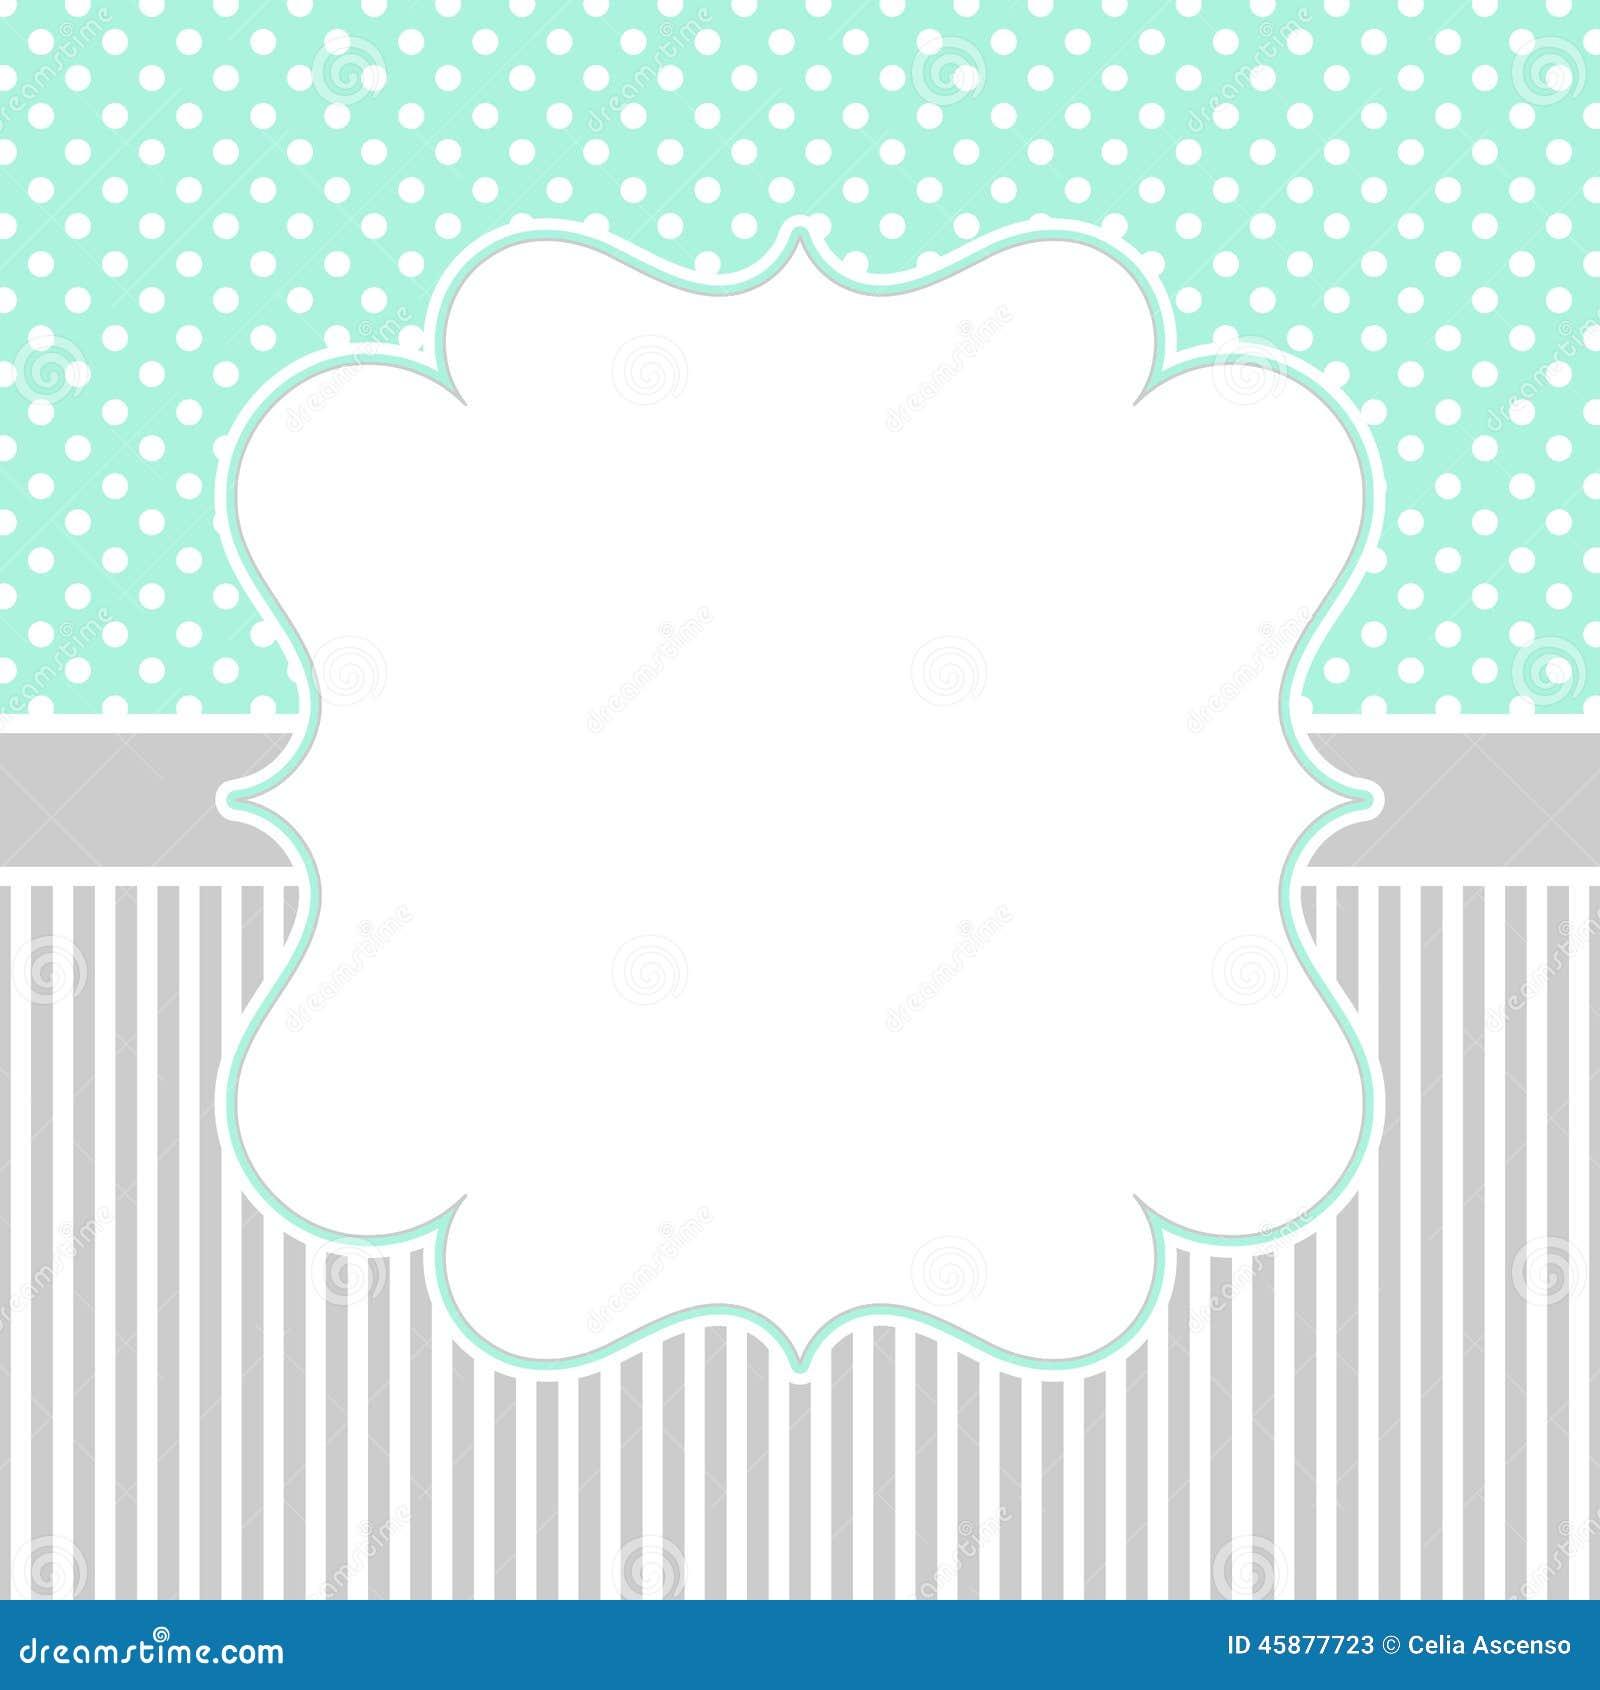 Polka Dots And Stripes Border Frame Stock Illustration